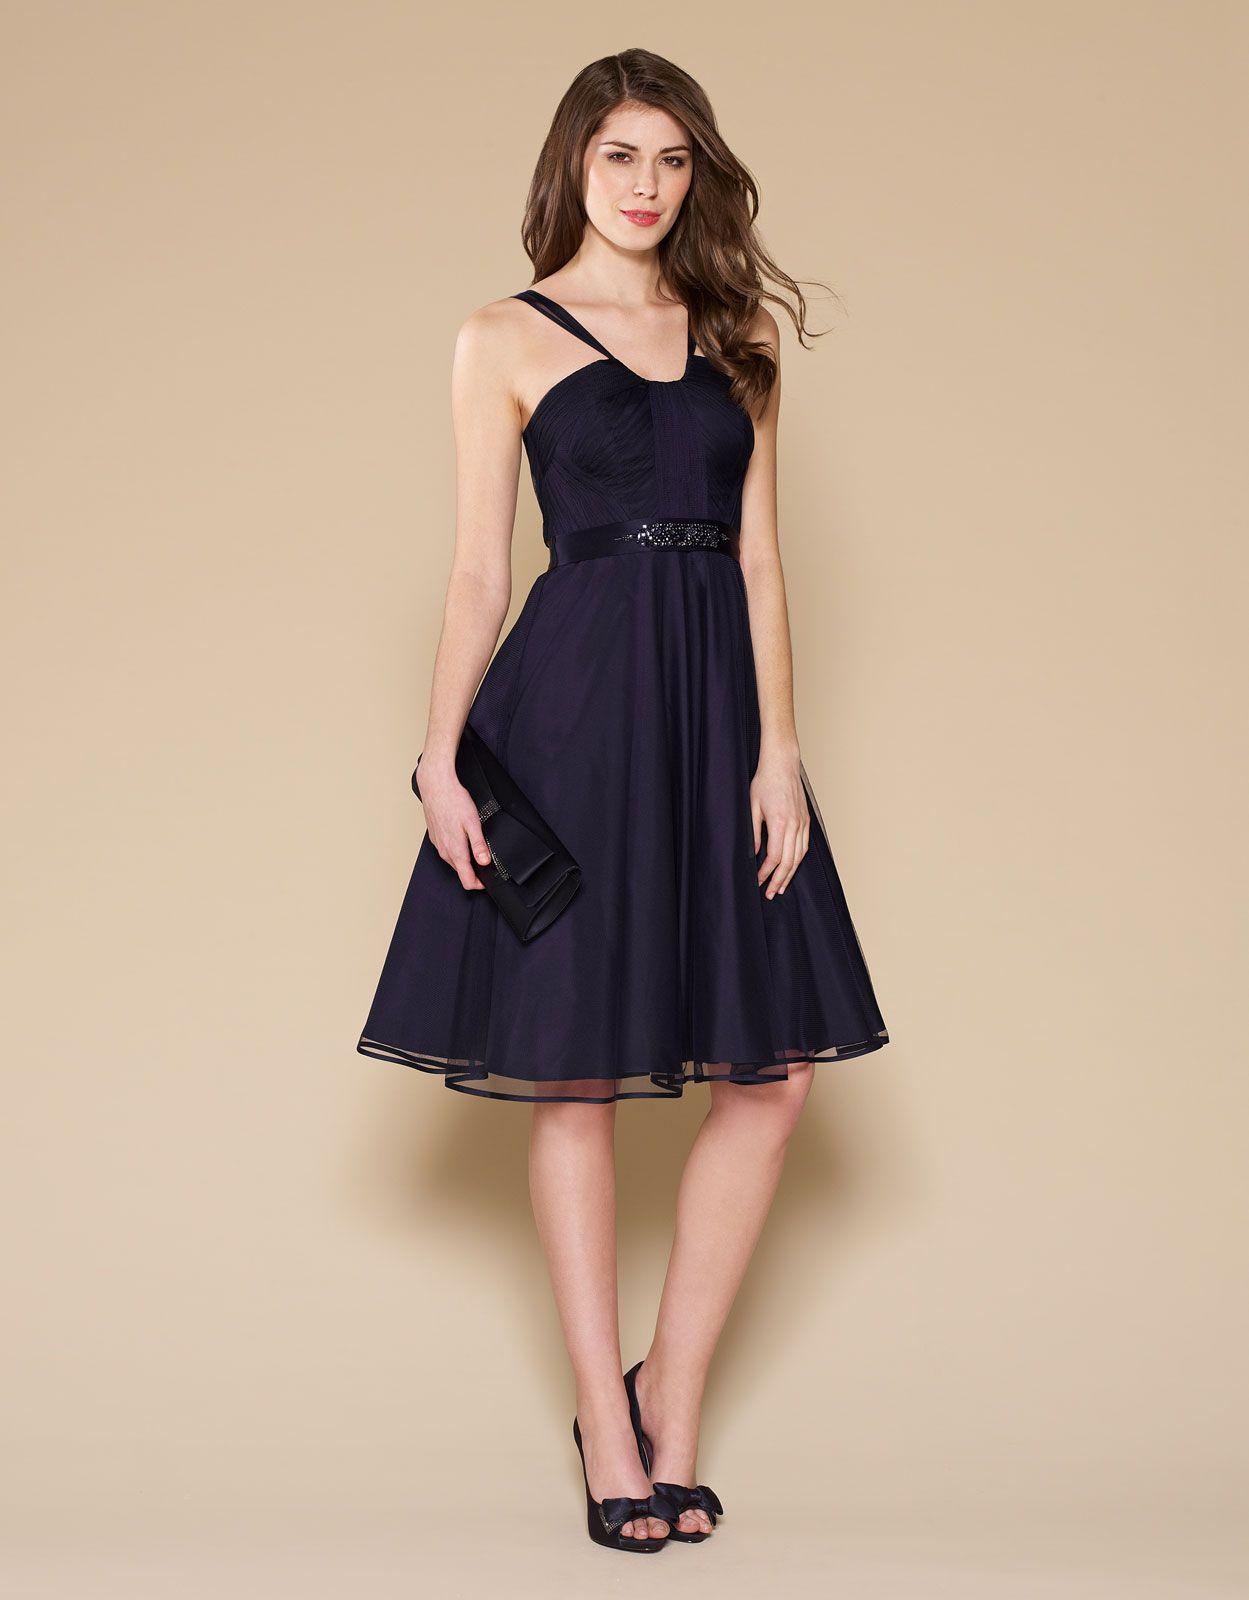 Lana prom dress navy monsoon bridesmaid dresses pinterest lana prom dress navy monsoon ombrellifo Choice Image